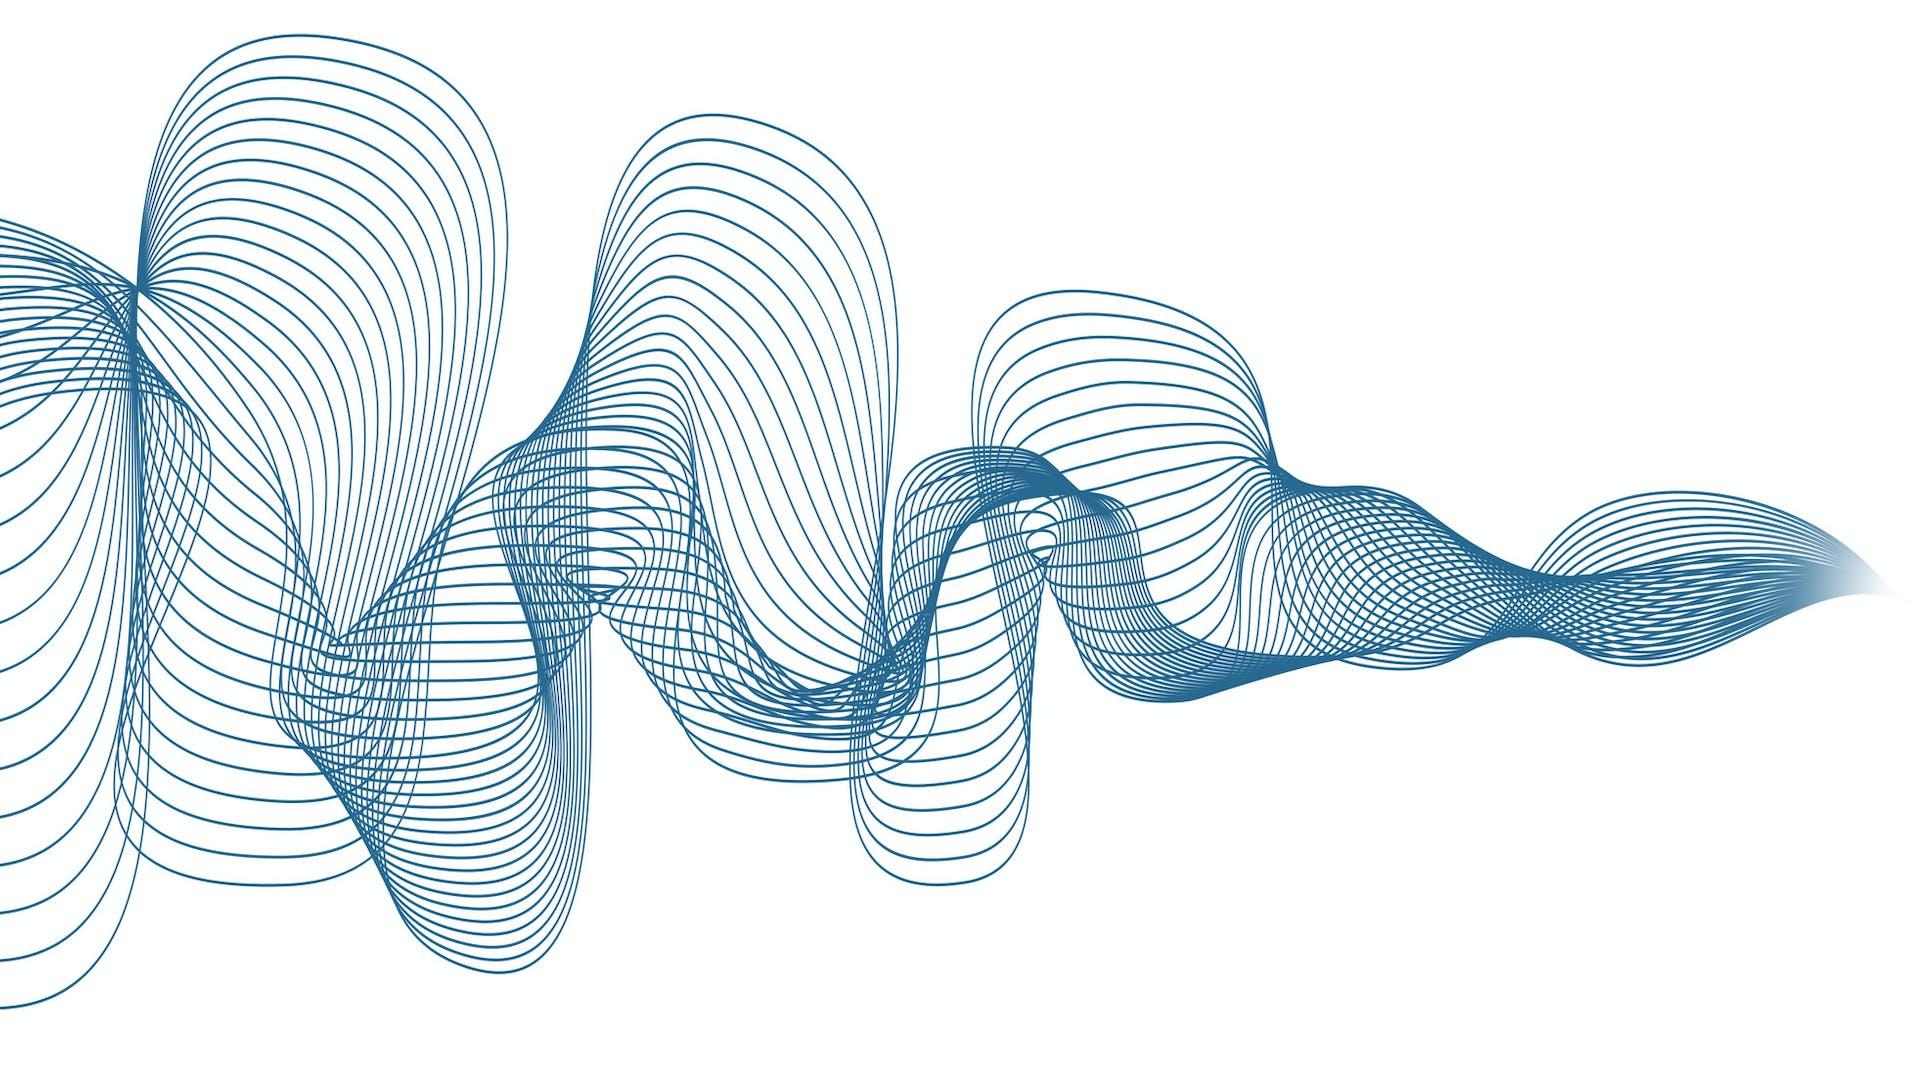 campaign illustration, dB campaign, dB range,  office, sound wave, sound insulation, sound absorption